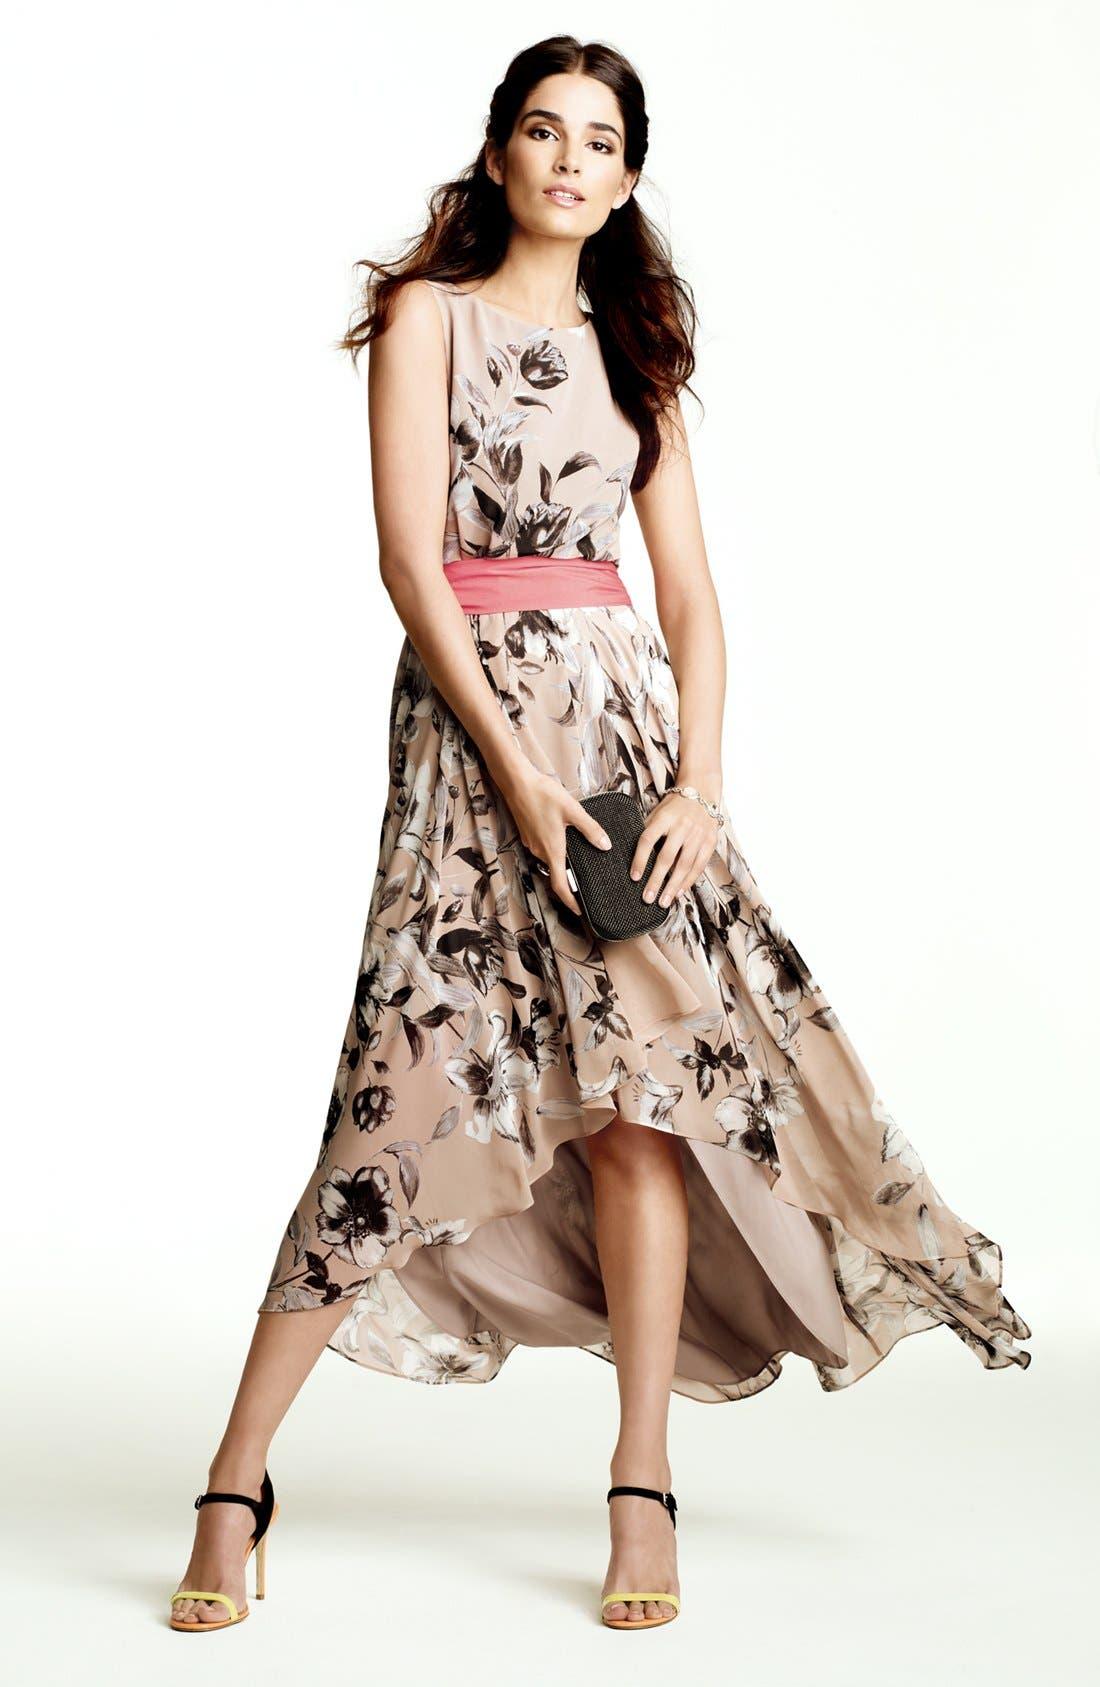 Alternate Image 1 Selected - Eliza J Maxi Dress & Accessories